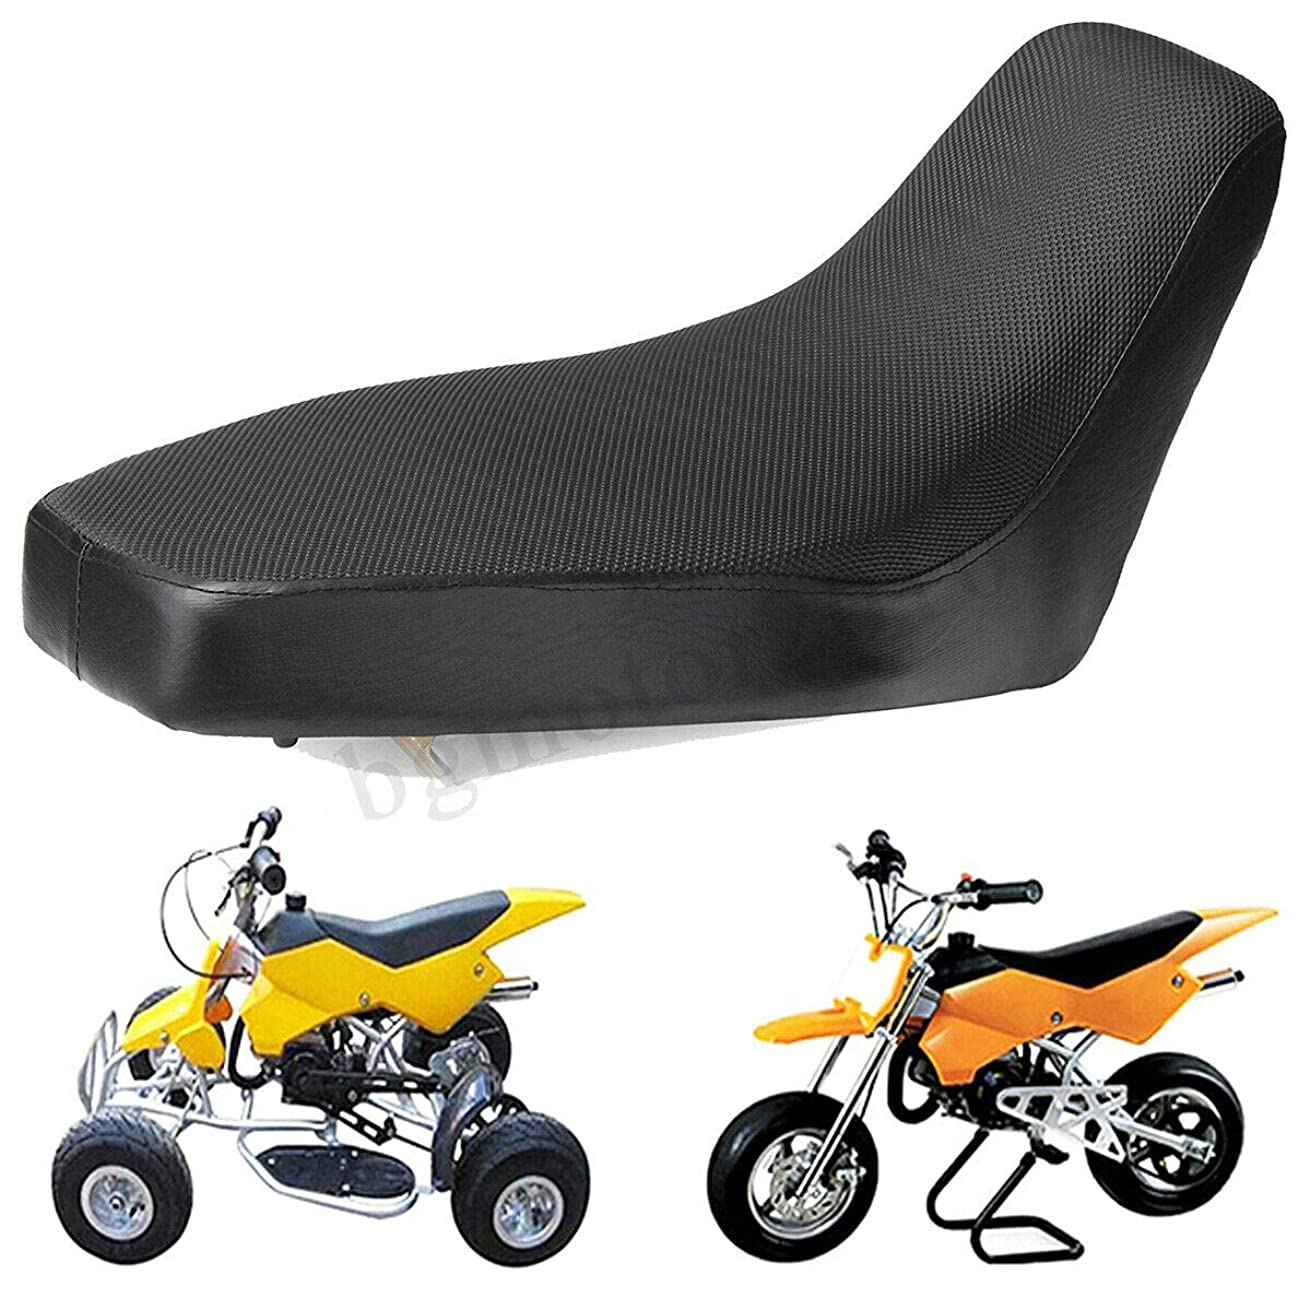 Foam Seat Cover For Kids ATV Quad Seat Taotao Peace Coolster 110cc Mini Polaris